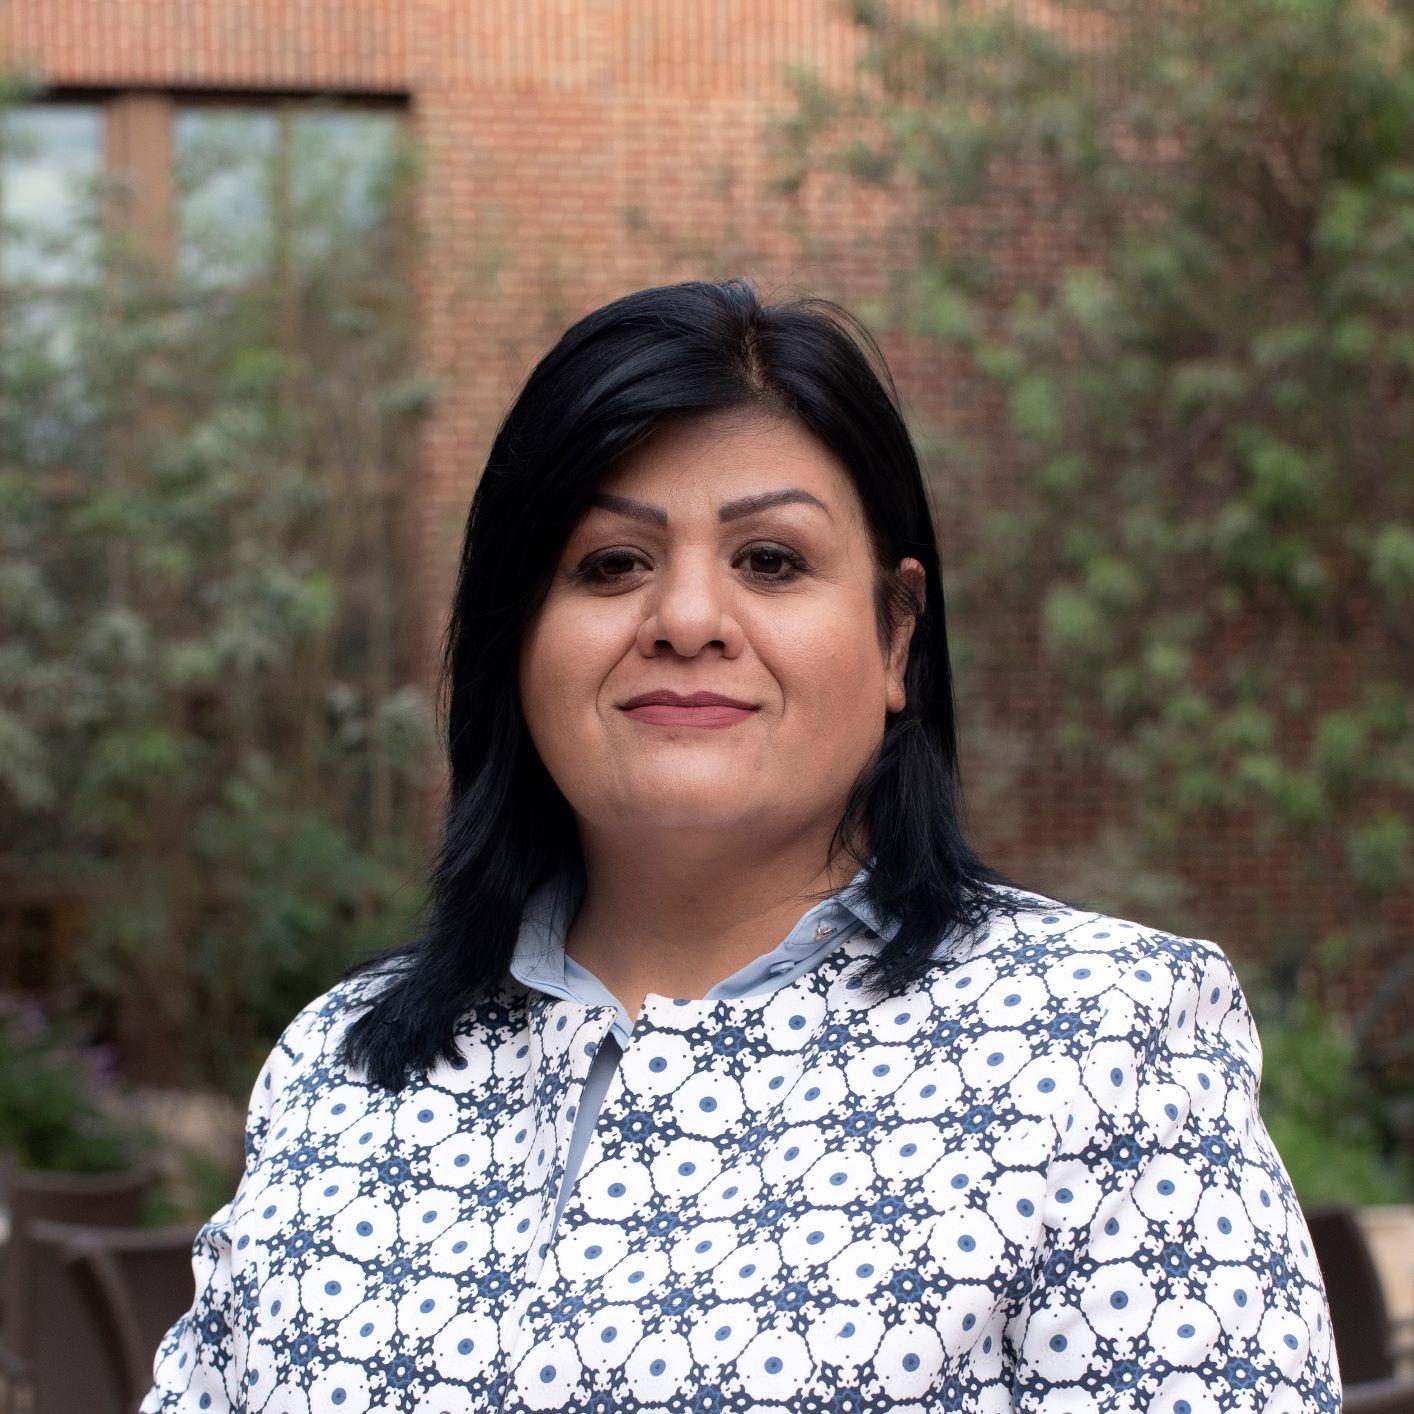 Q&A with WE Lead Scholar Nadia Behboodi